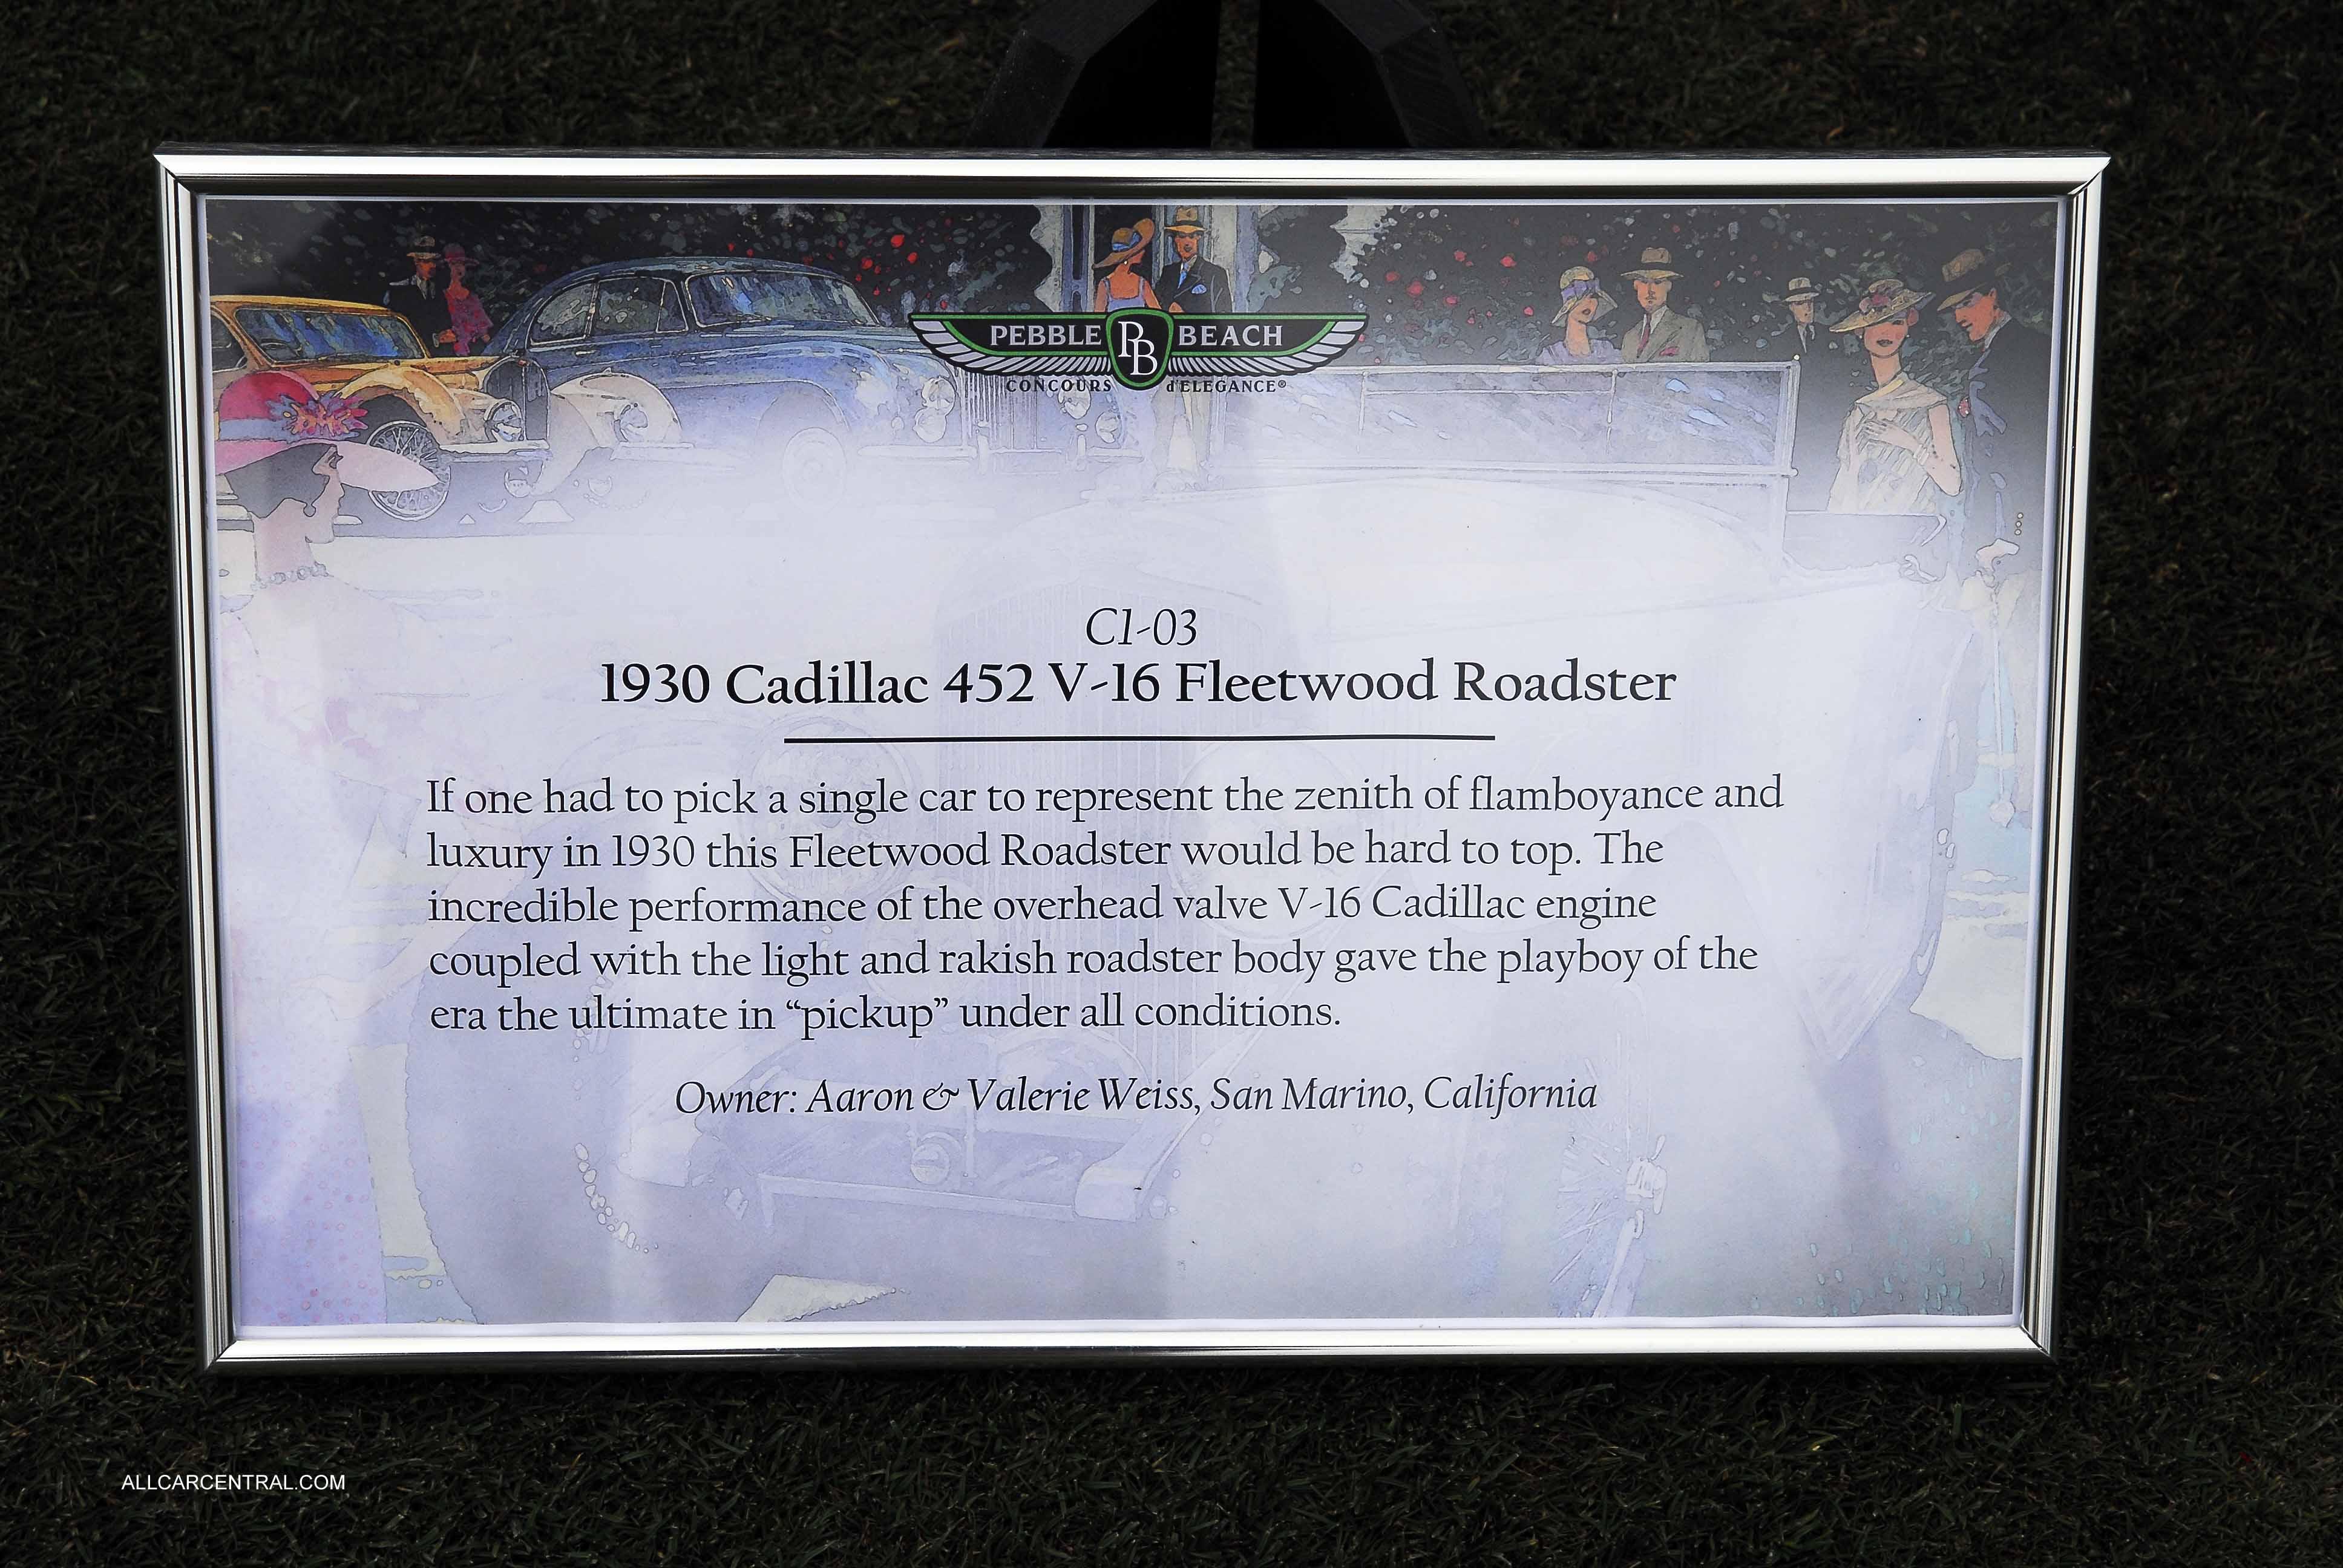 Cadillac photographs and